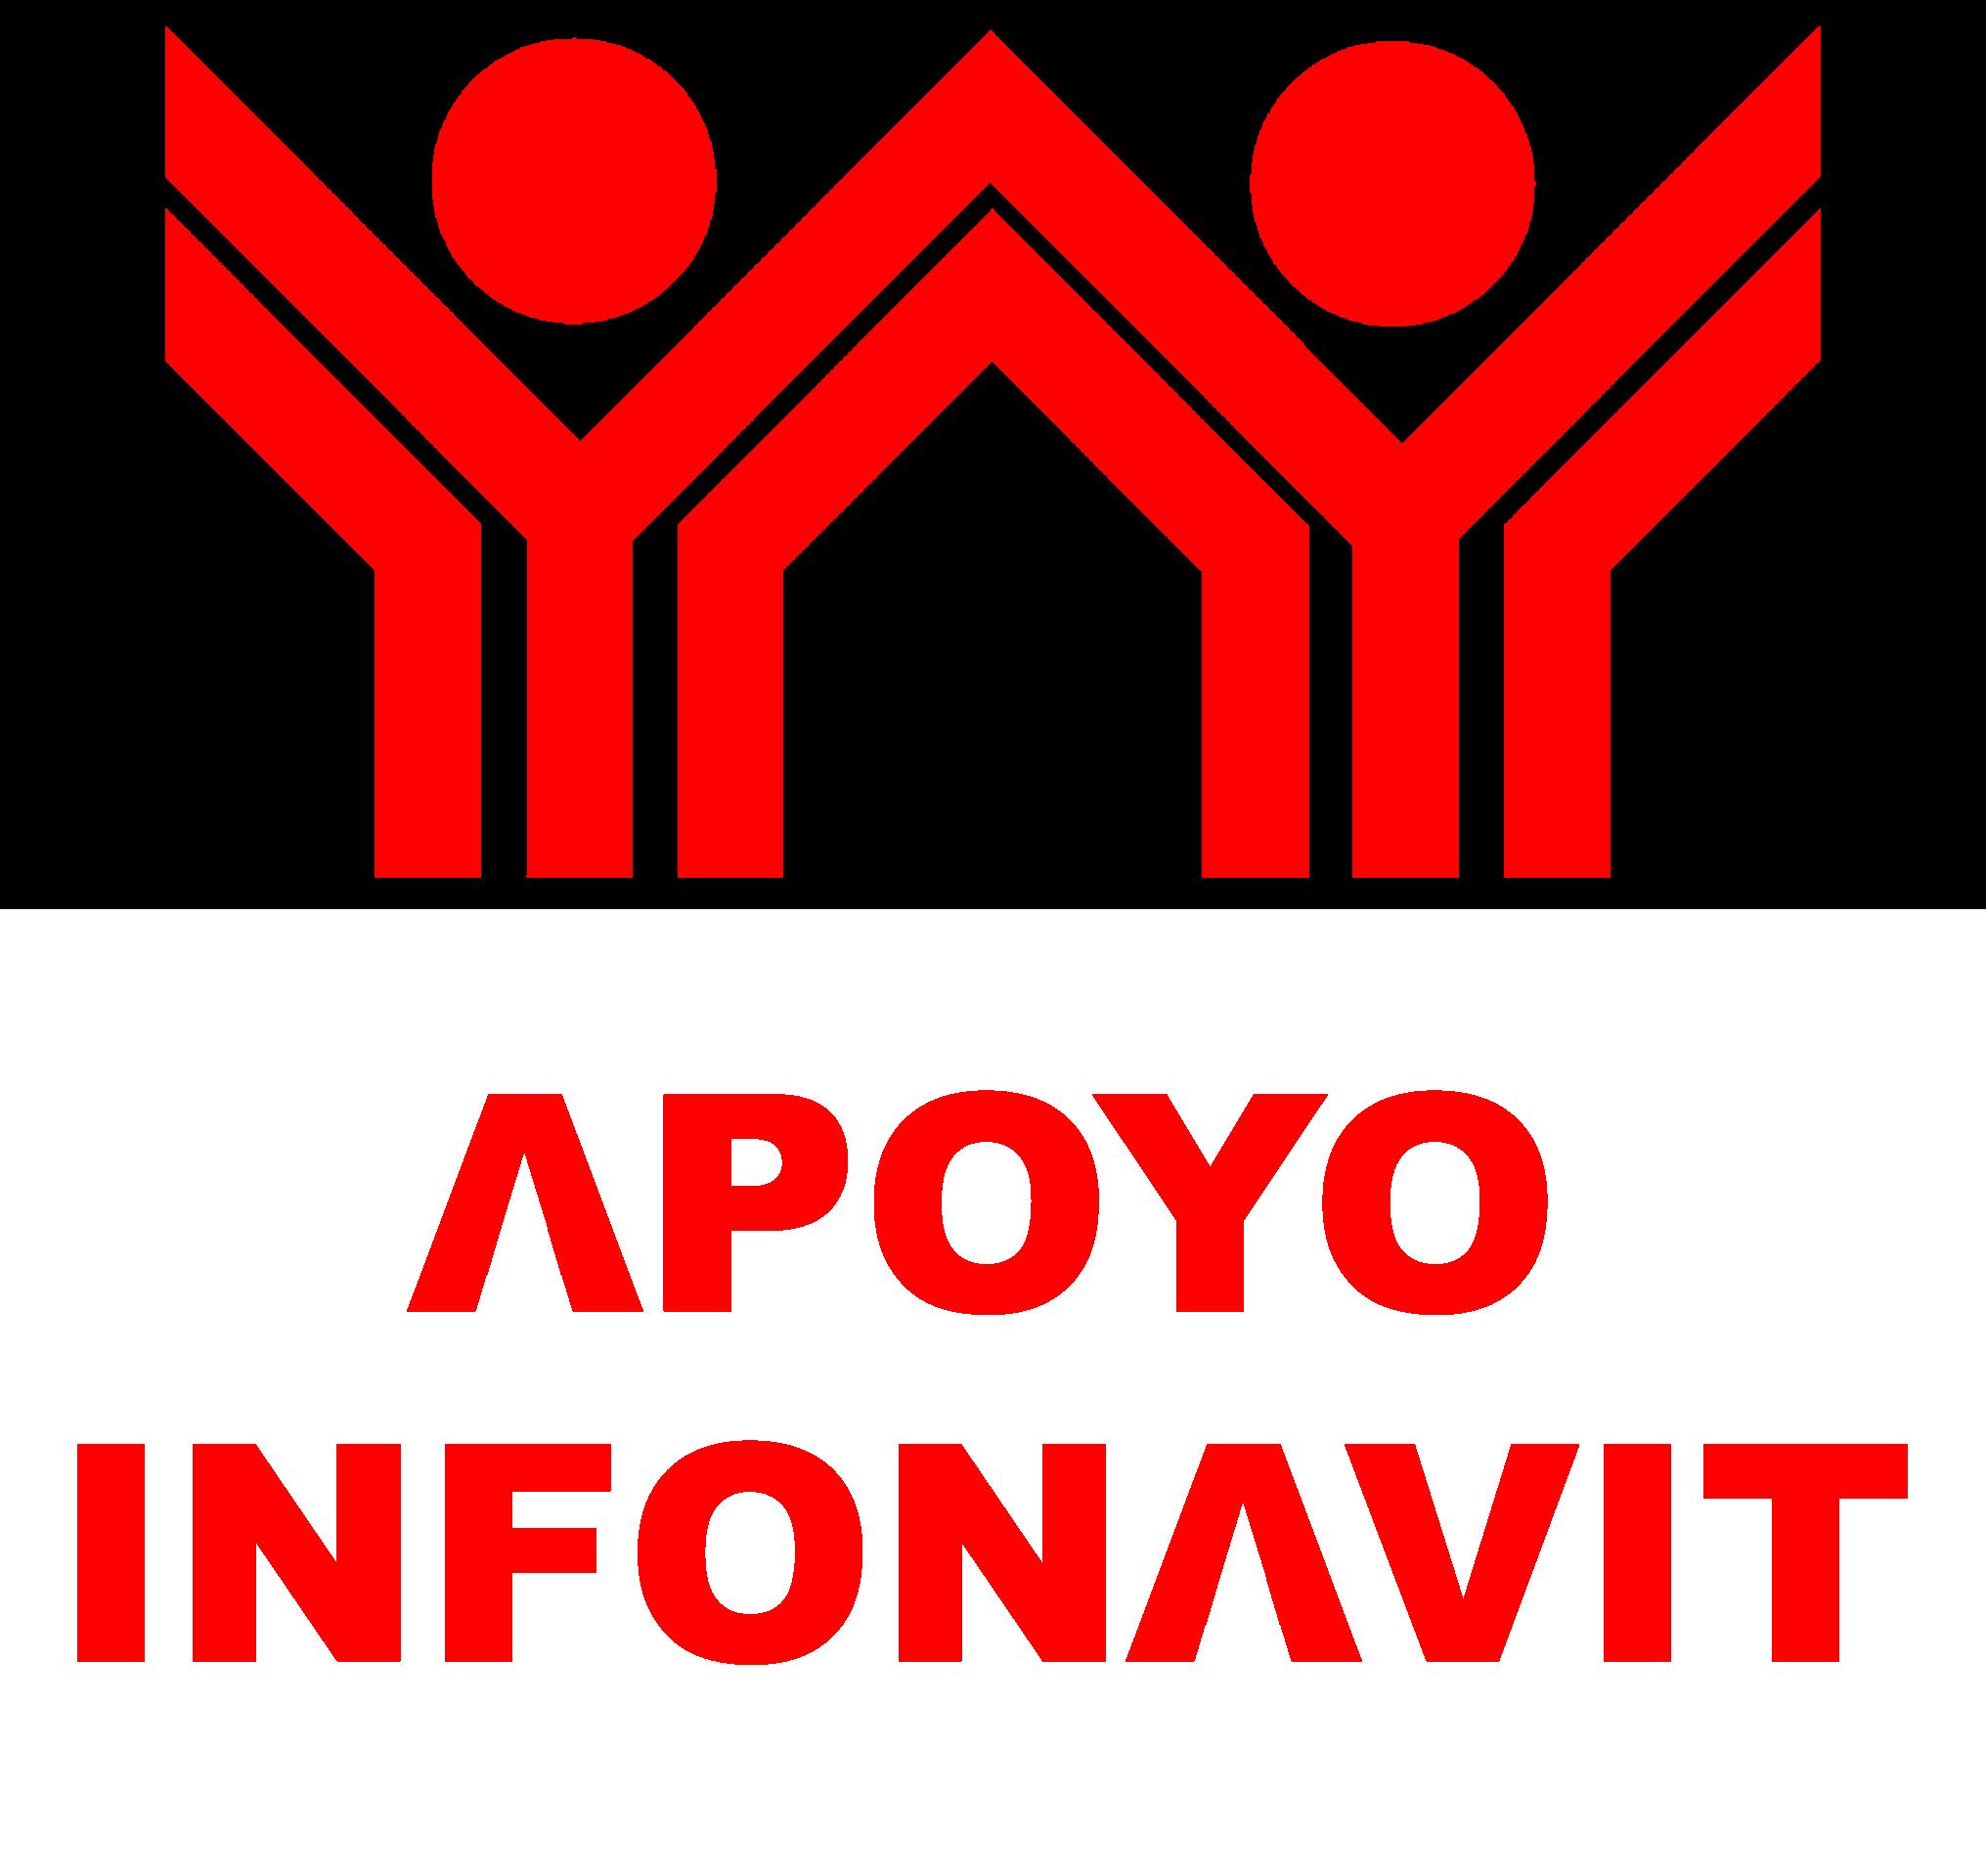 APOYO INFONAVIT